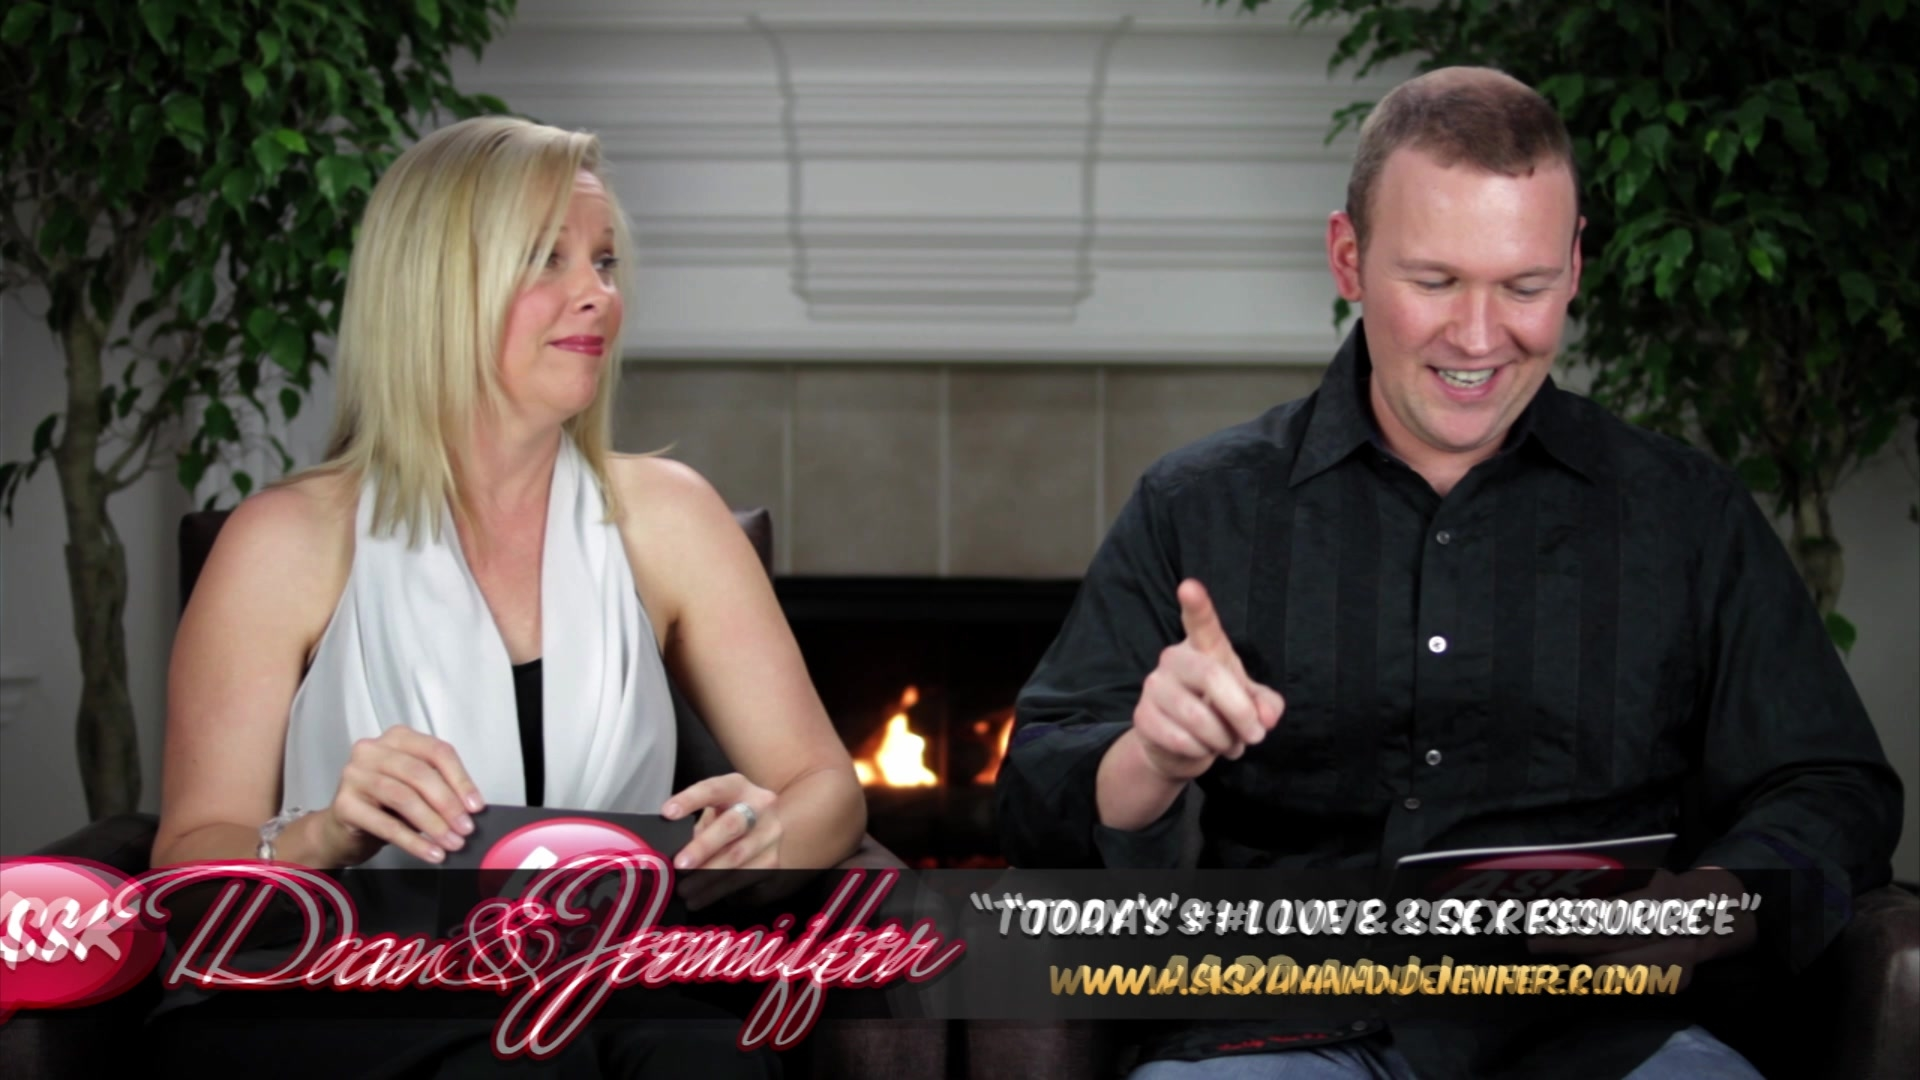 Free online partner erotica videos